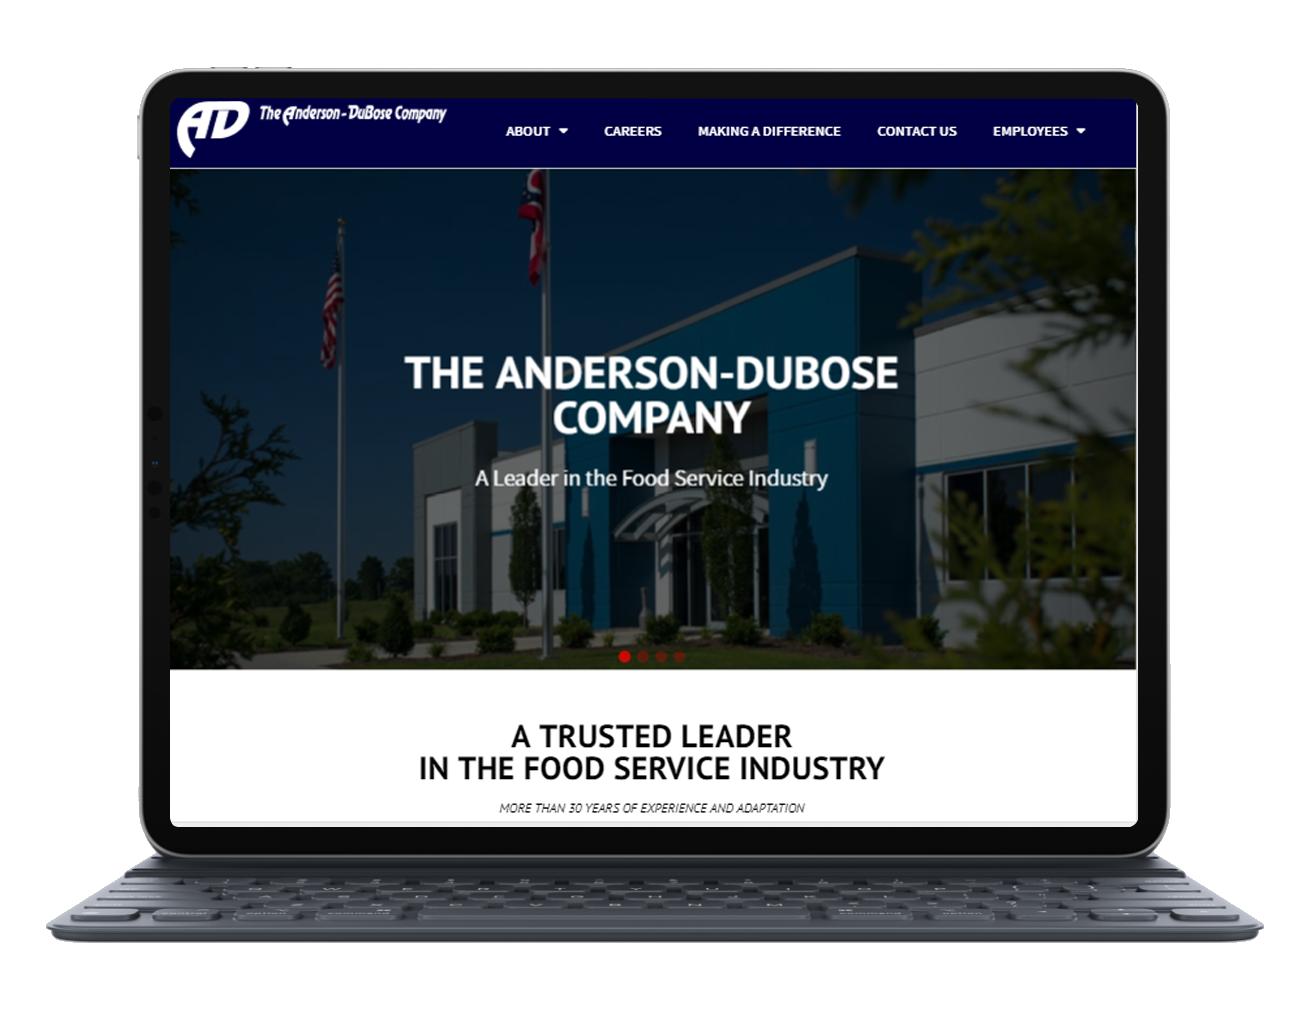 Web Design Services Cleveland Oh